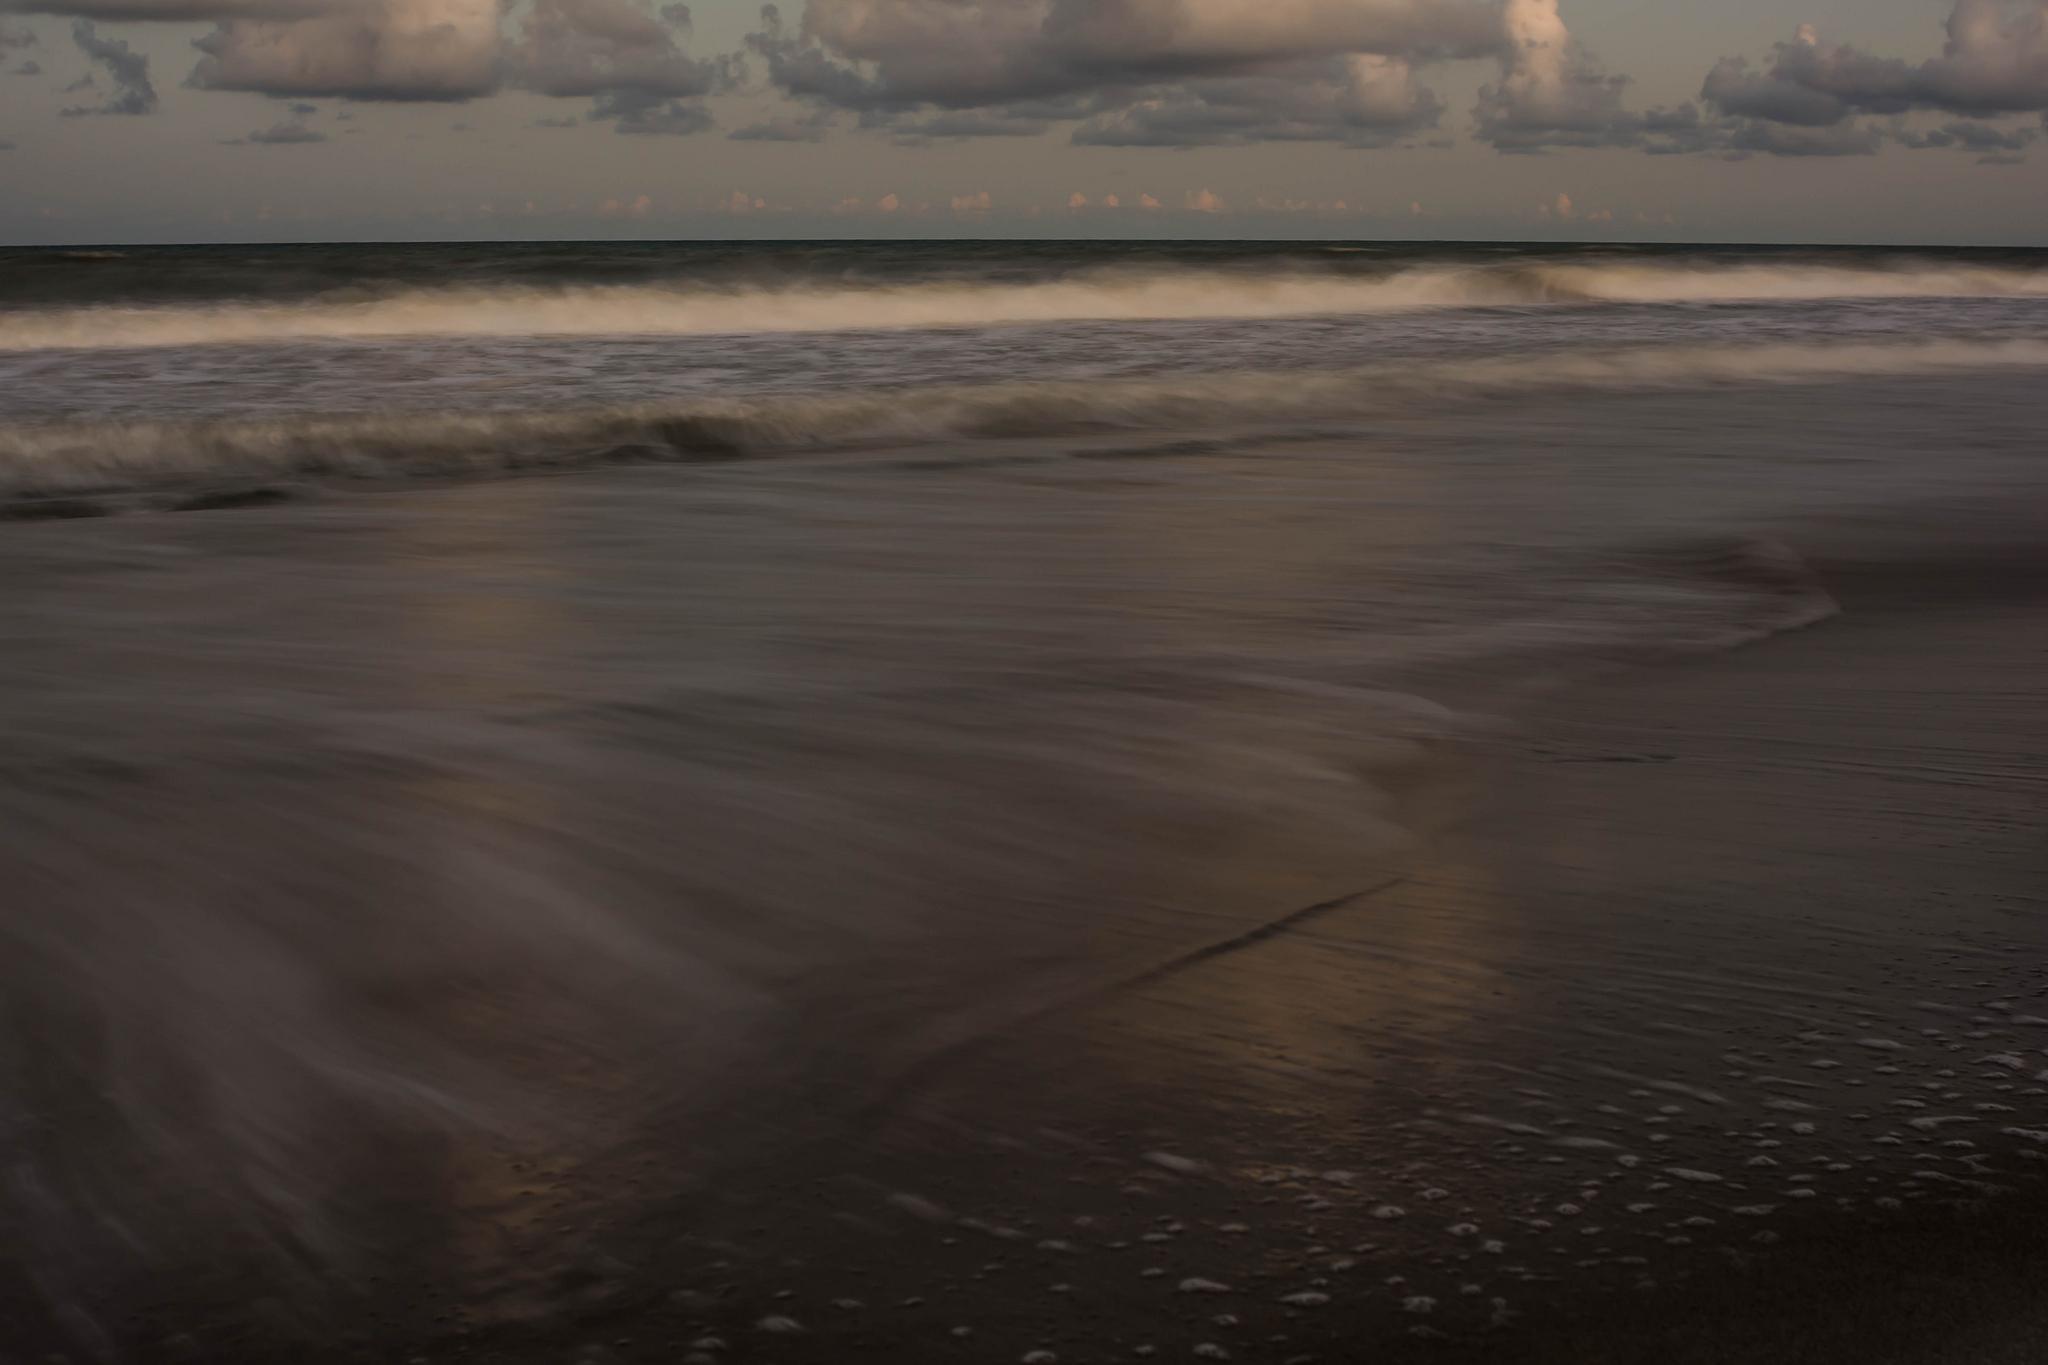 Florida Beach © Spencer Harris/flickr